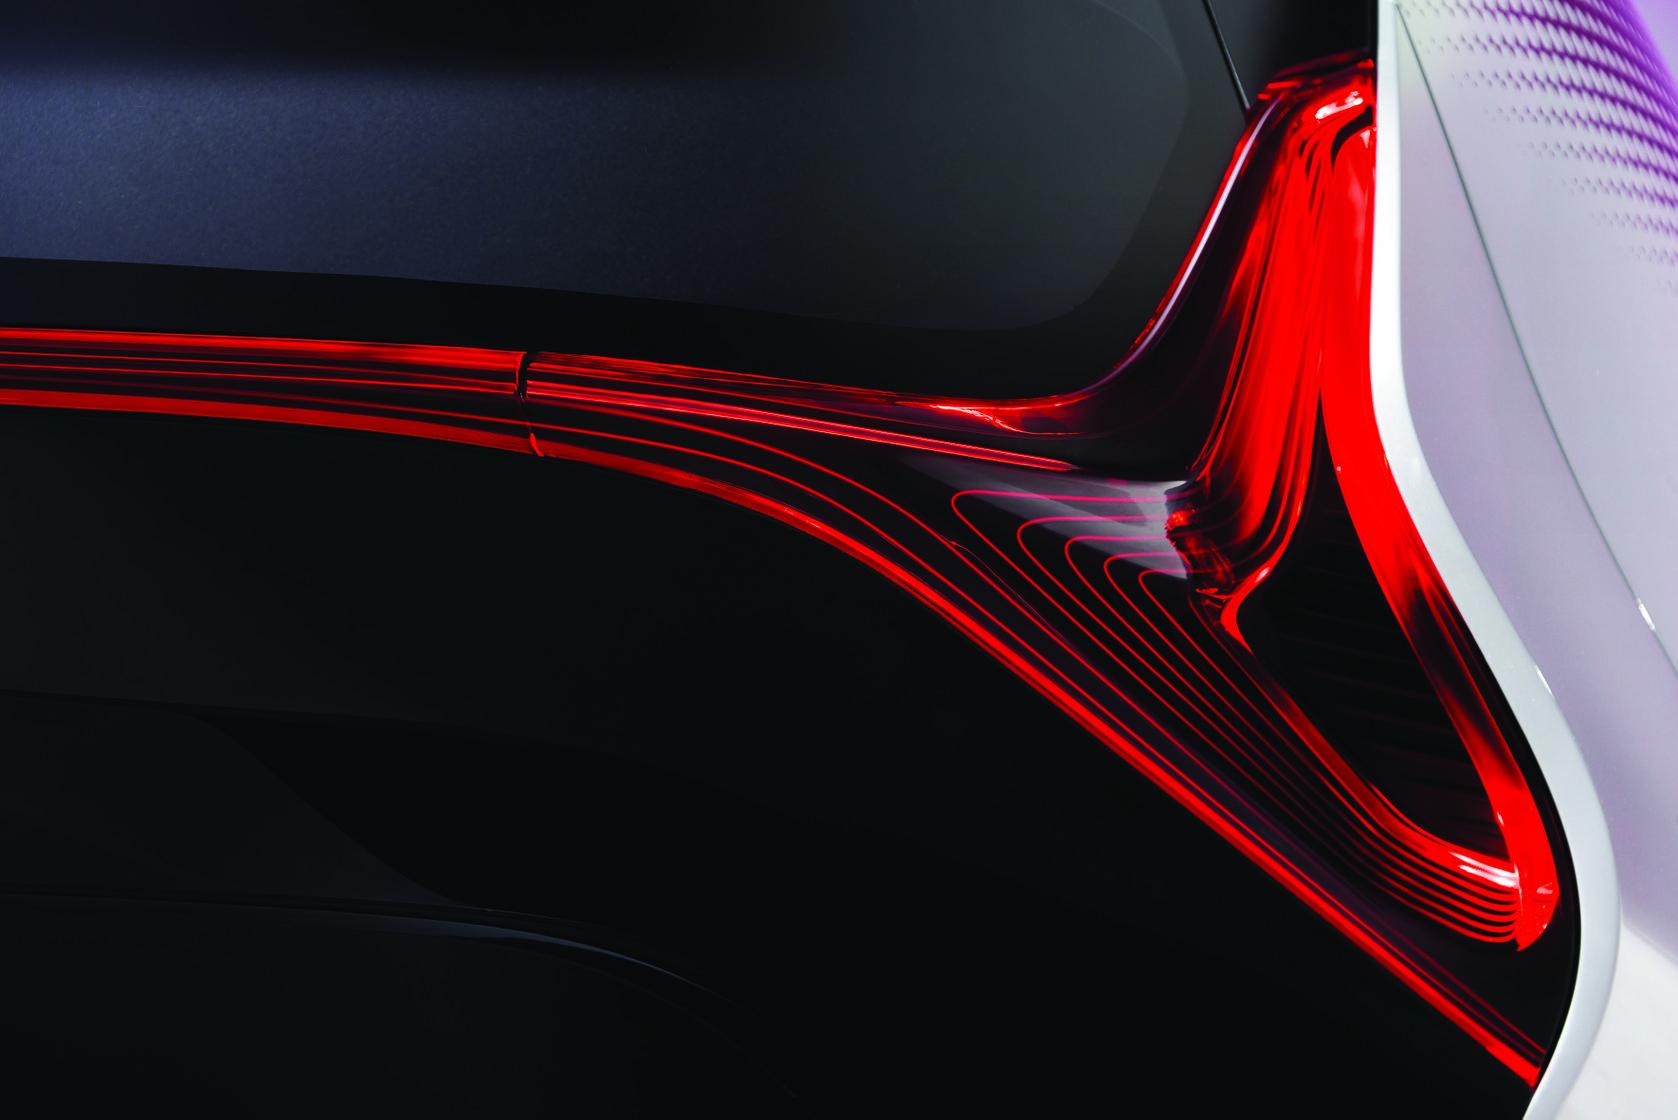 2017-toyota-concept-i-tril-exteriordet-06